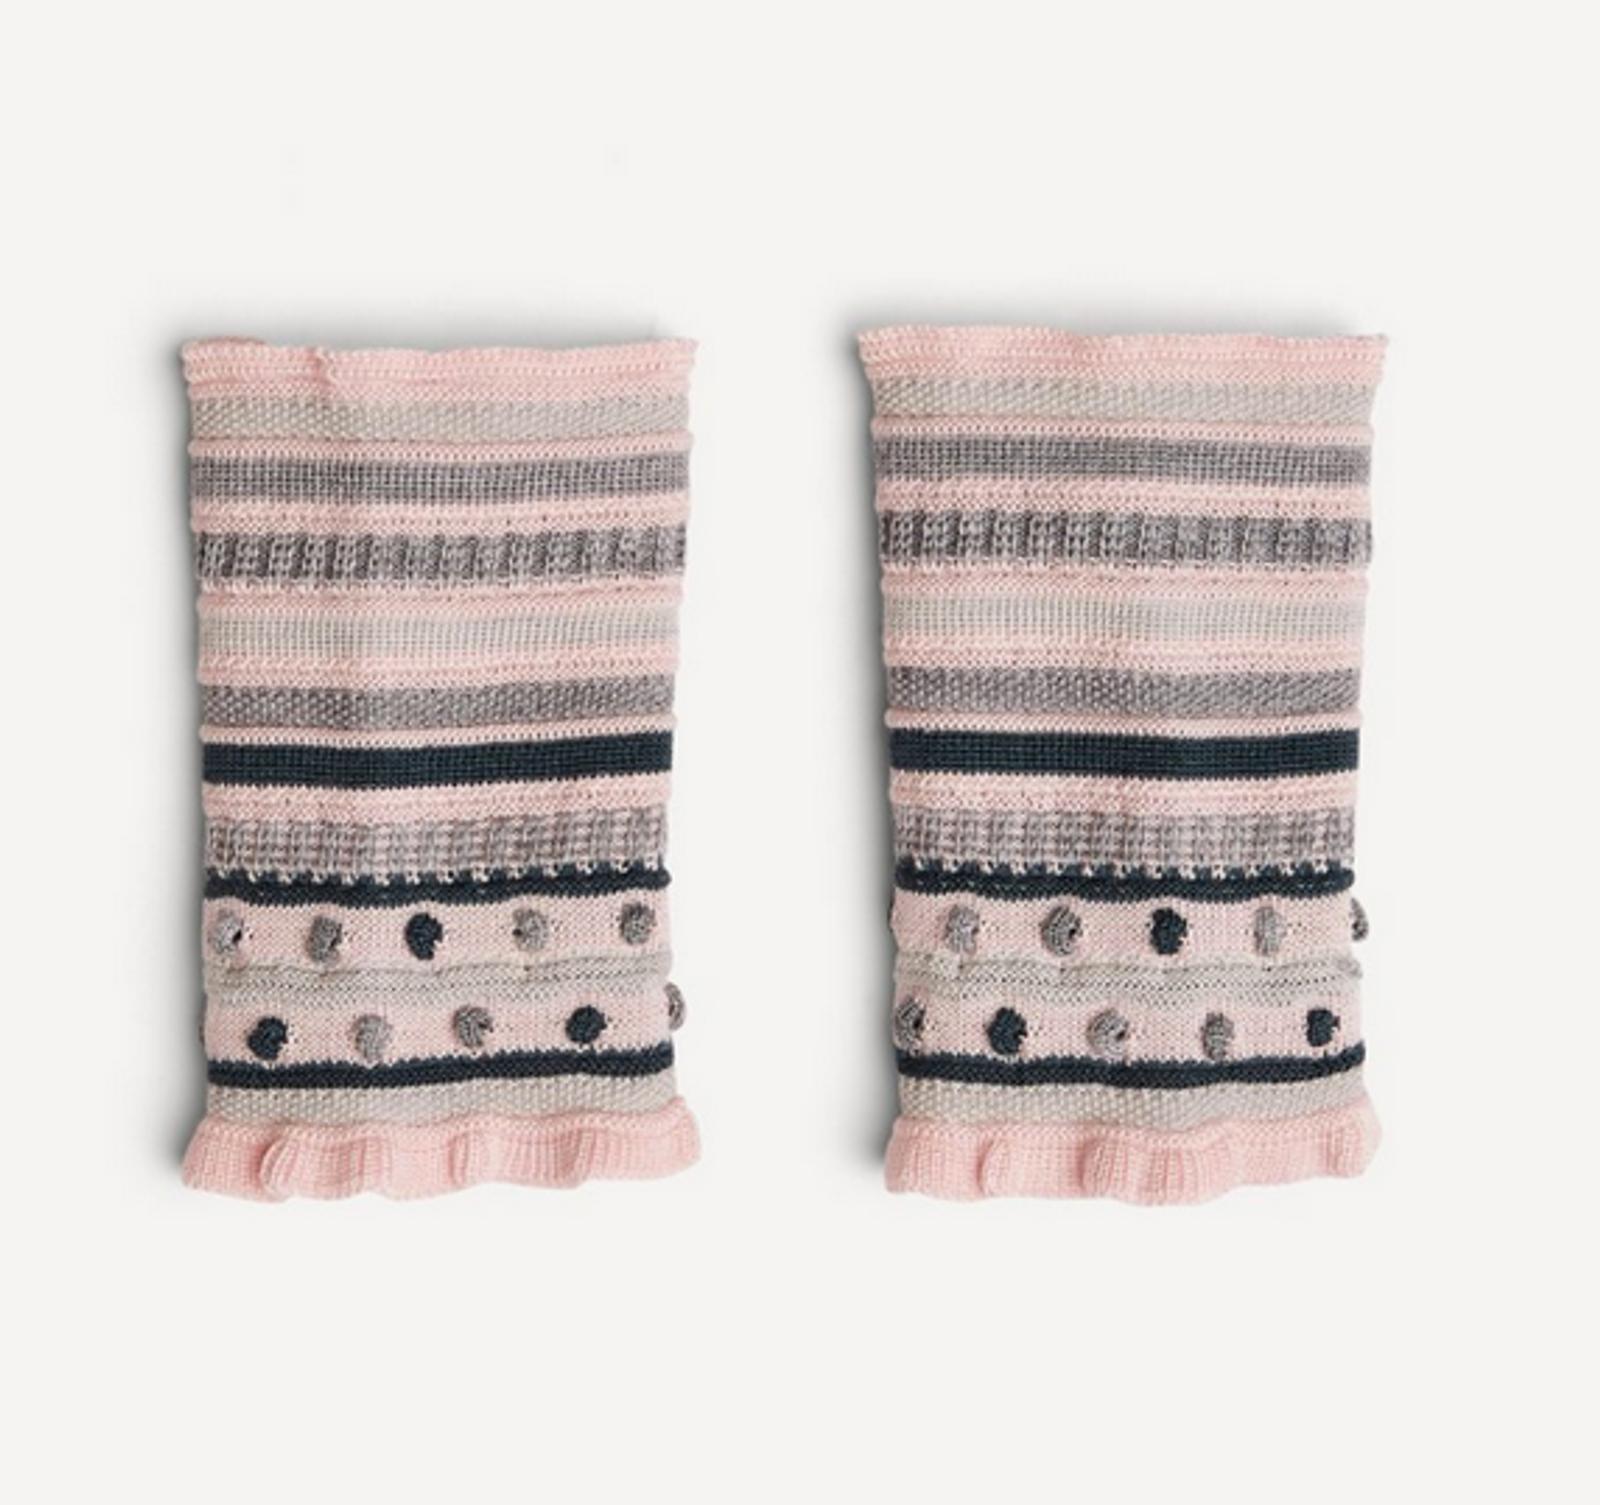 Amelia Oleana Popcorn and Stripe Wristlet, 347VD Pink/Grey